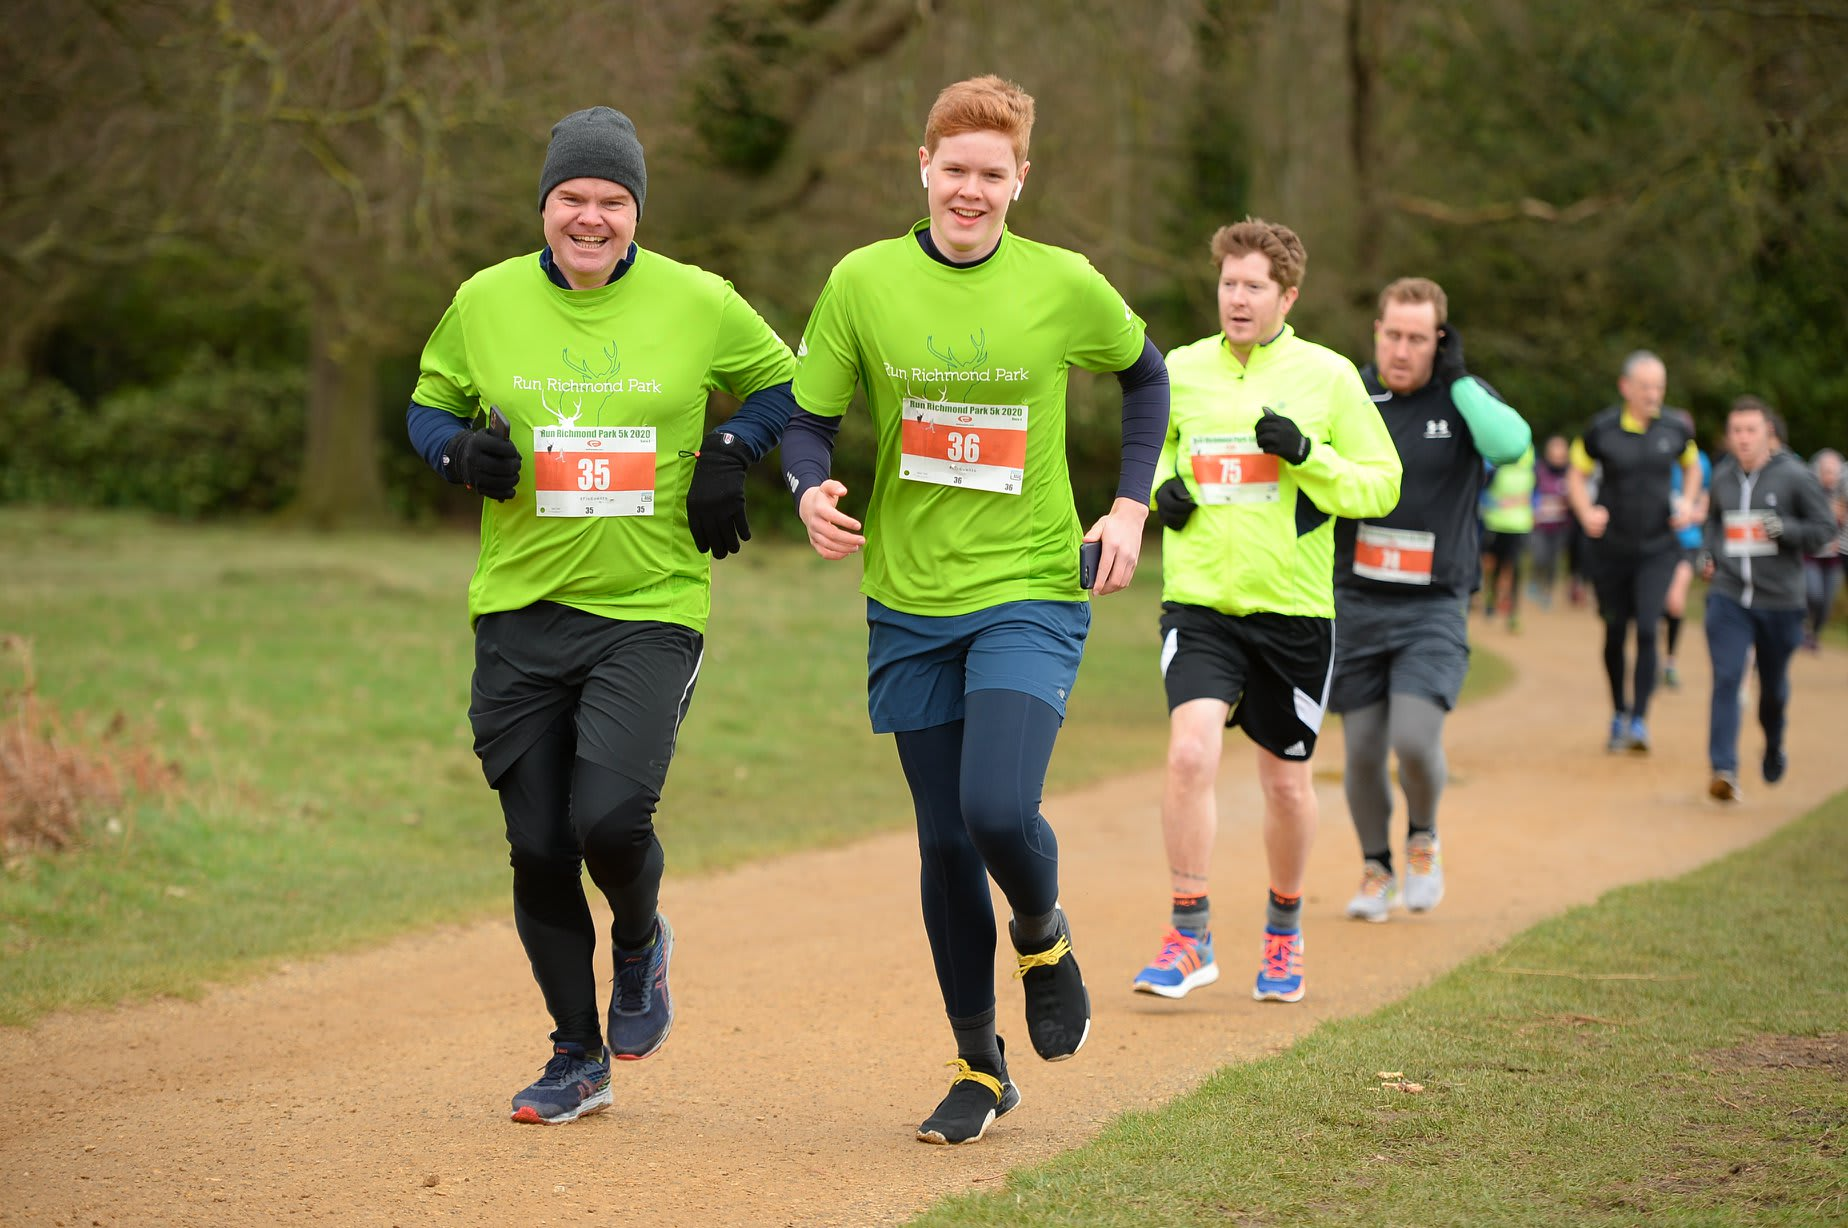 Run Richmond Park 5k, 10k & Half Marathon